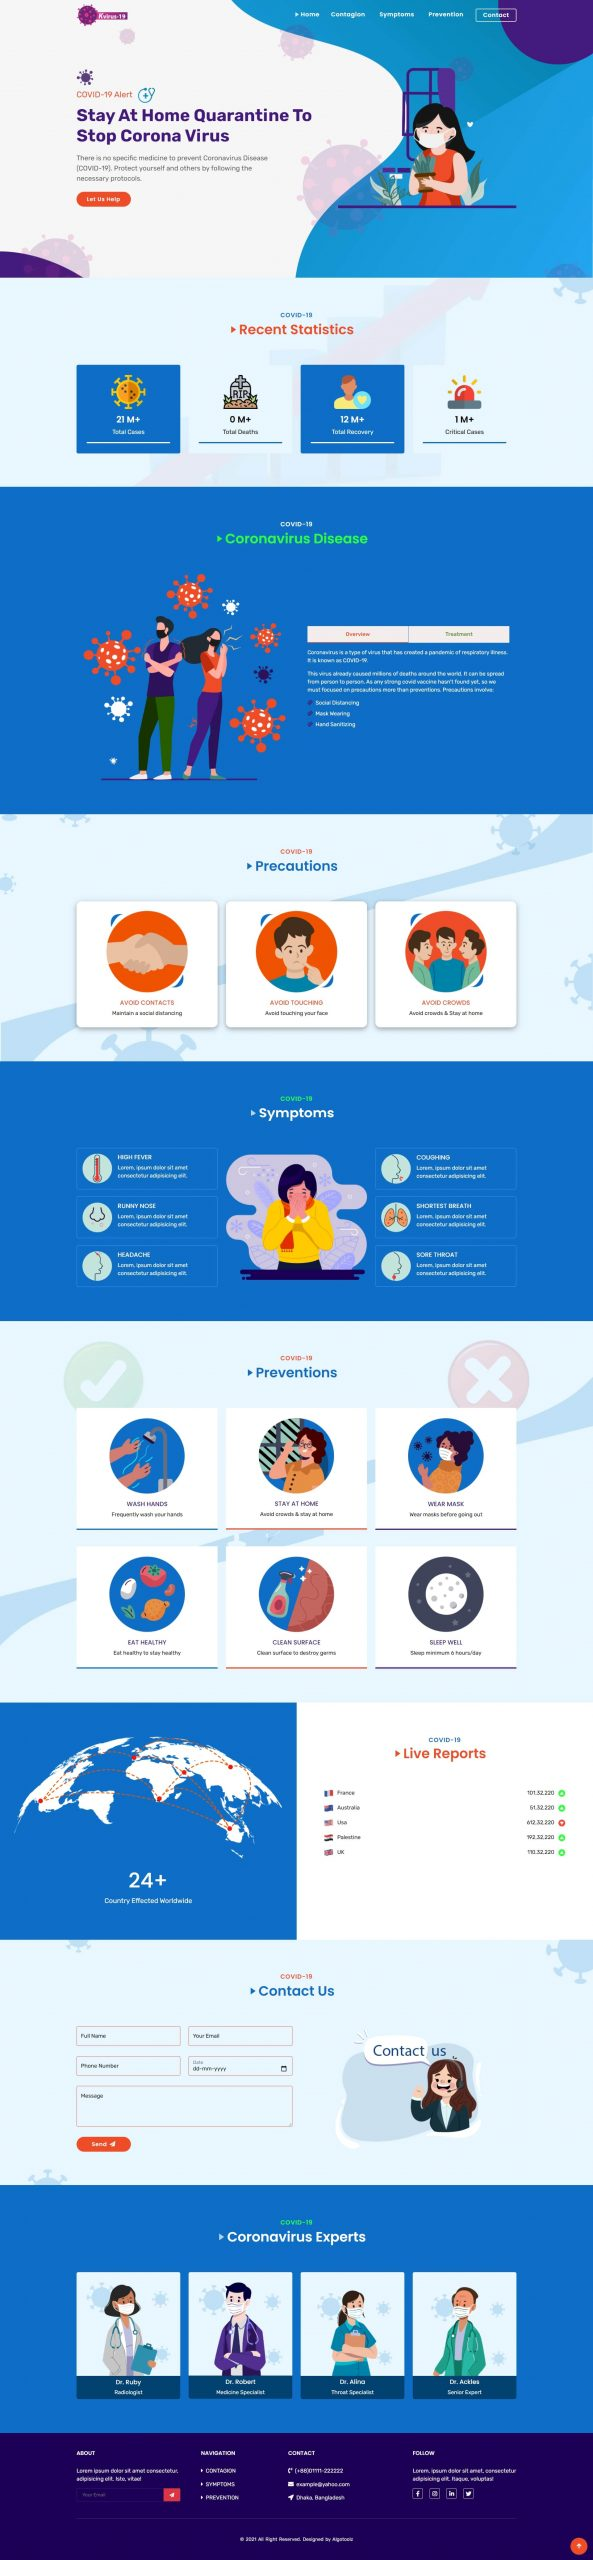 Kvirus19 - Medical & Healthcare Website Template - Illustrated Coronavirus Website Design With Animation Effects